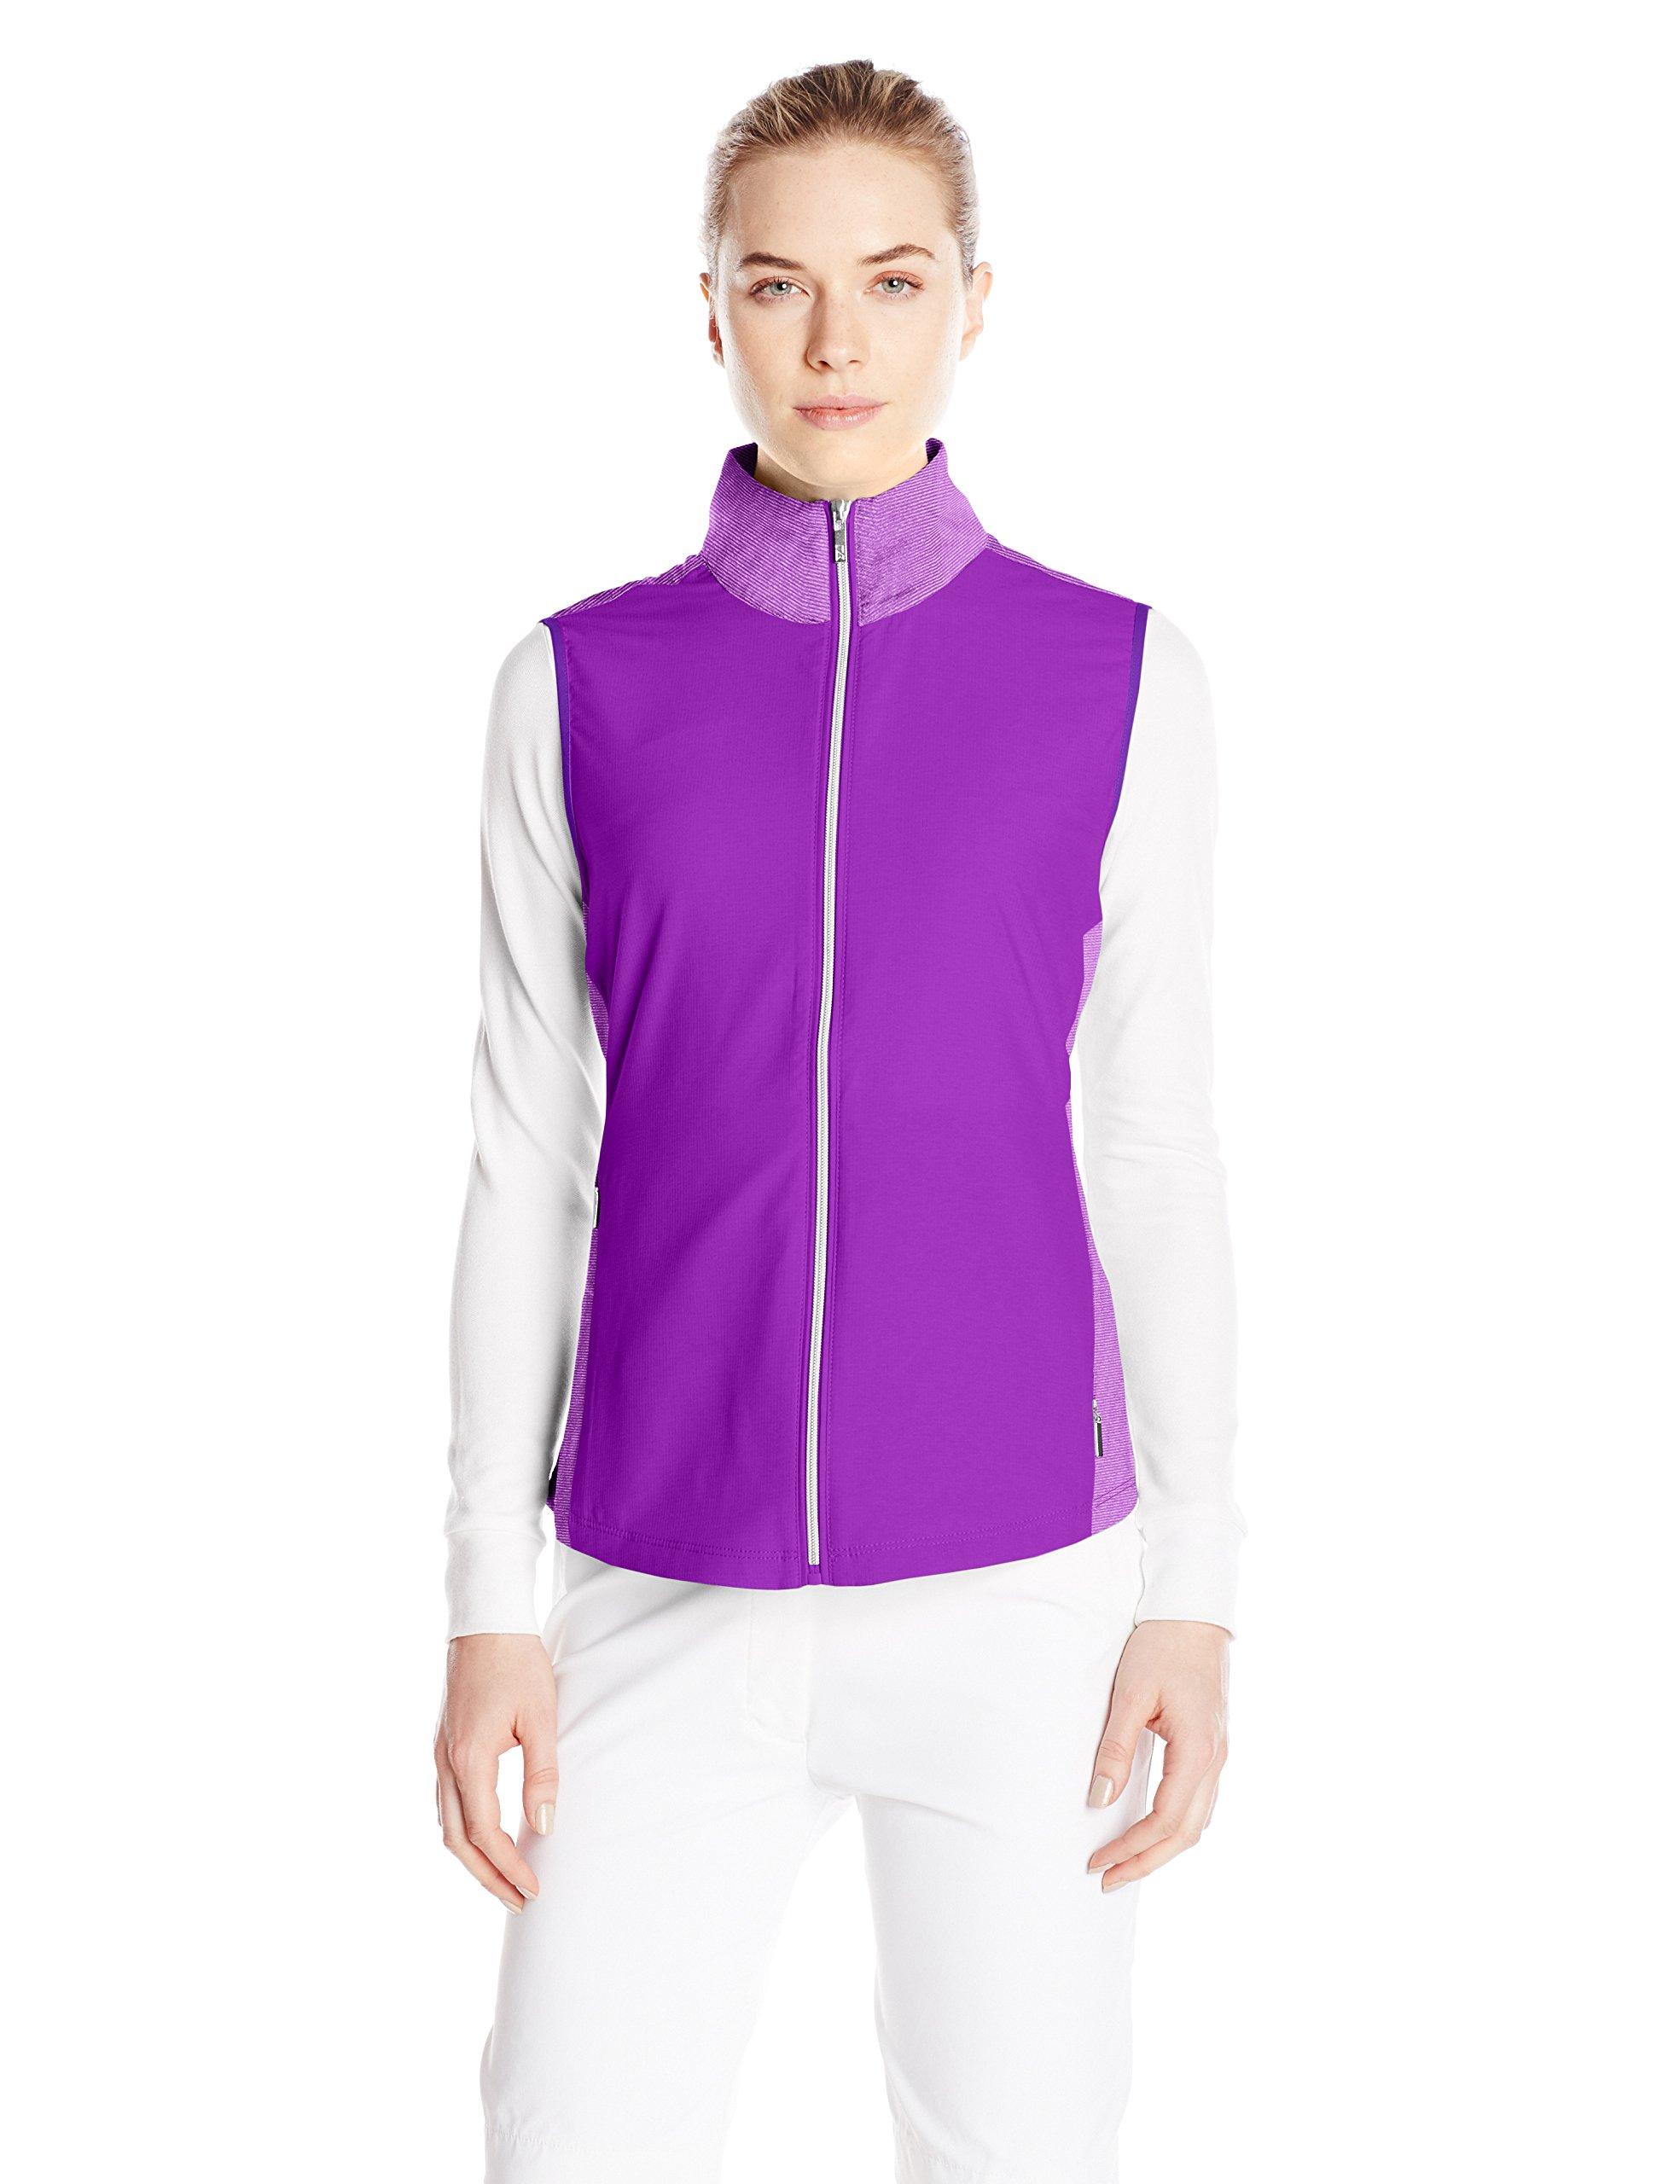 Cutter & Buck Women's CB Weathertec Laura Hybrid Vest, BlackBerry, Small by Cutter & Buck (Image #1)